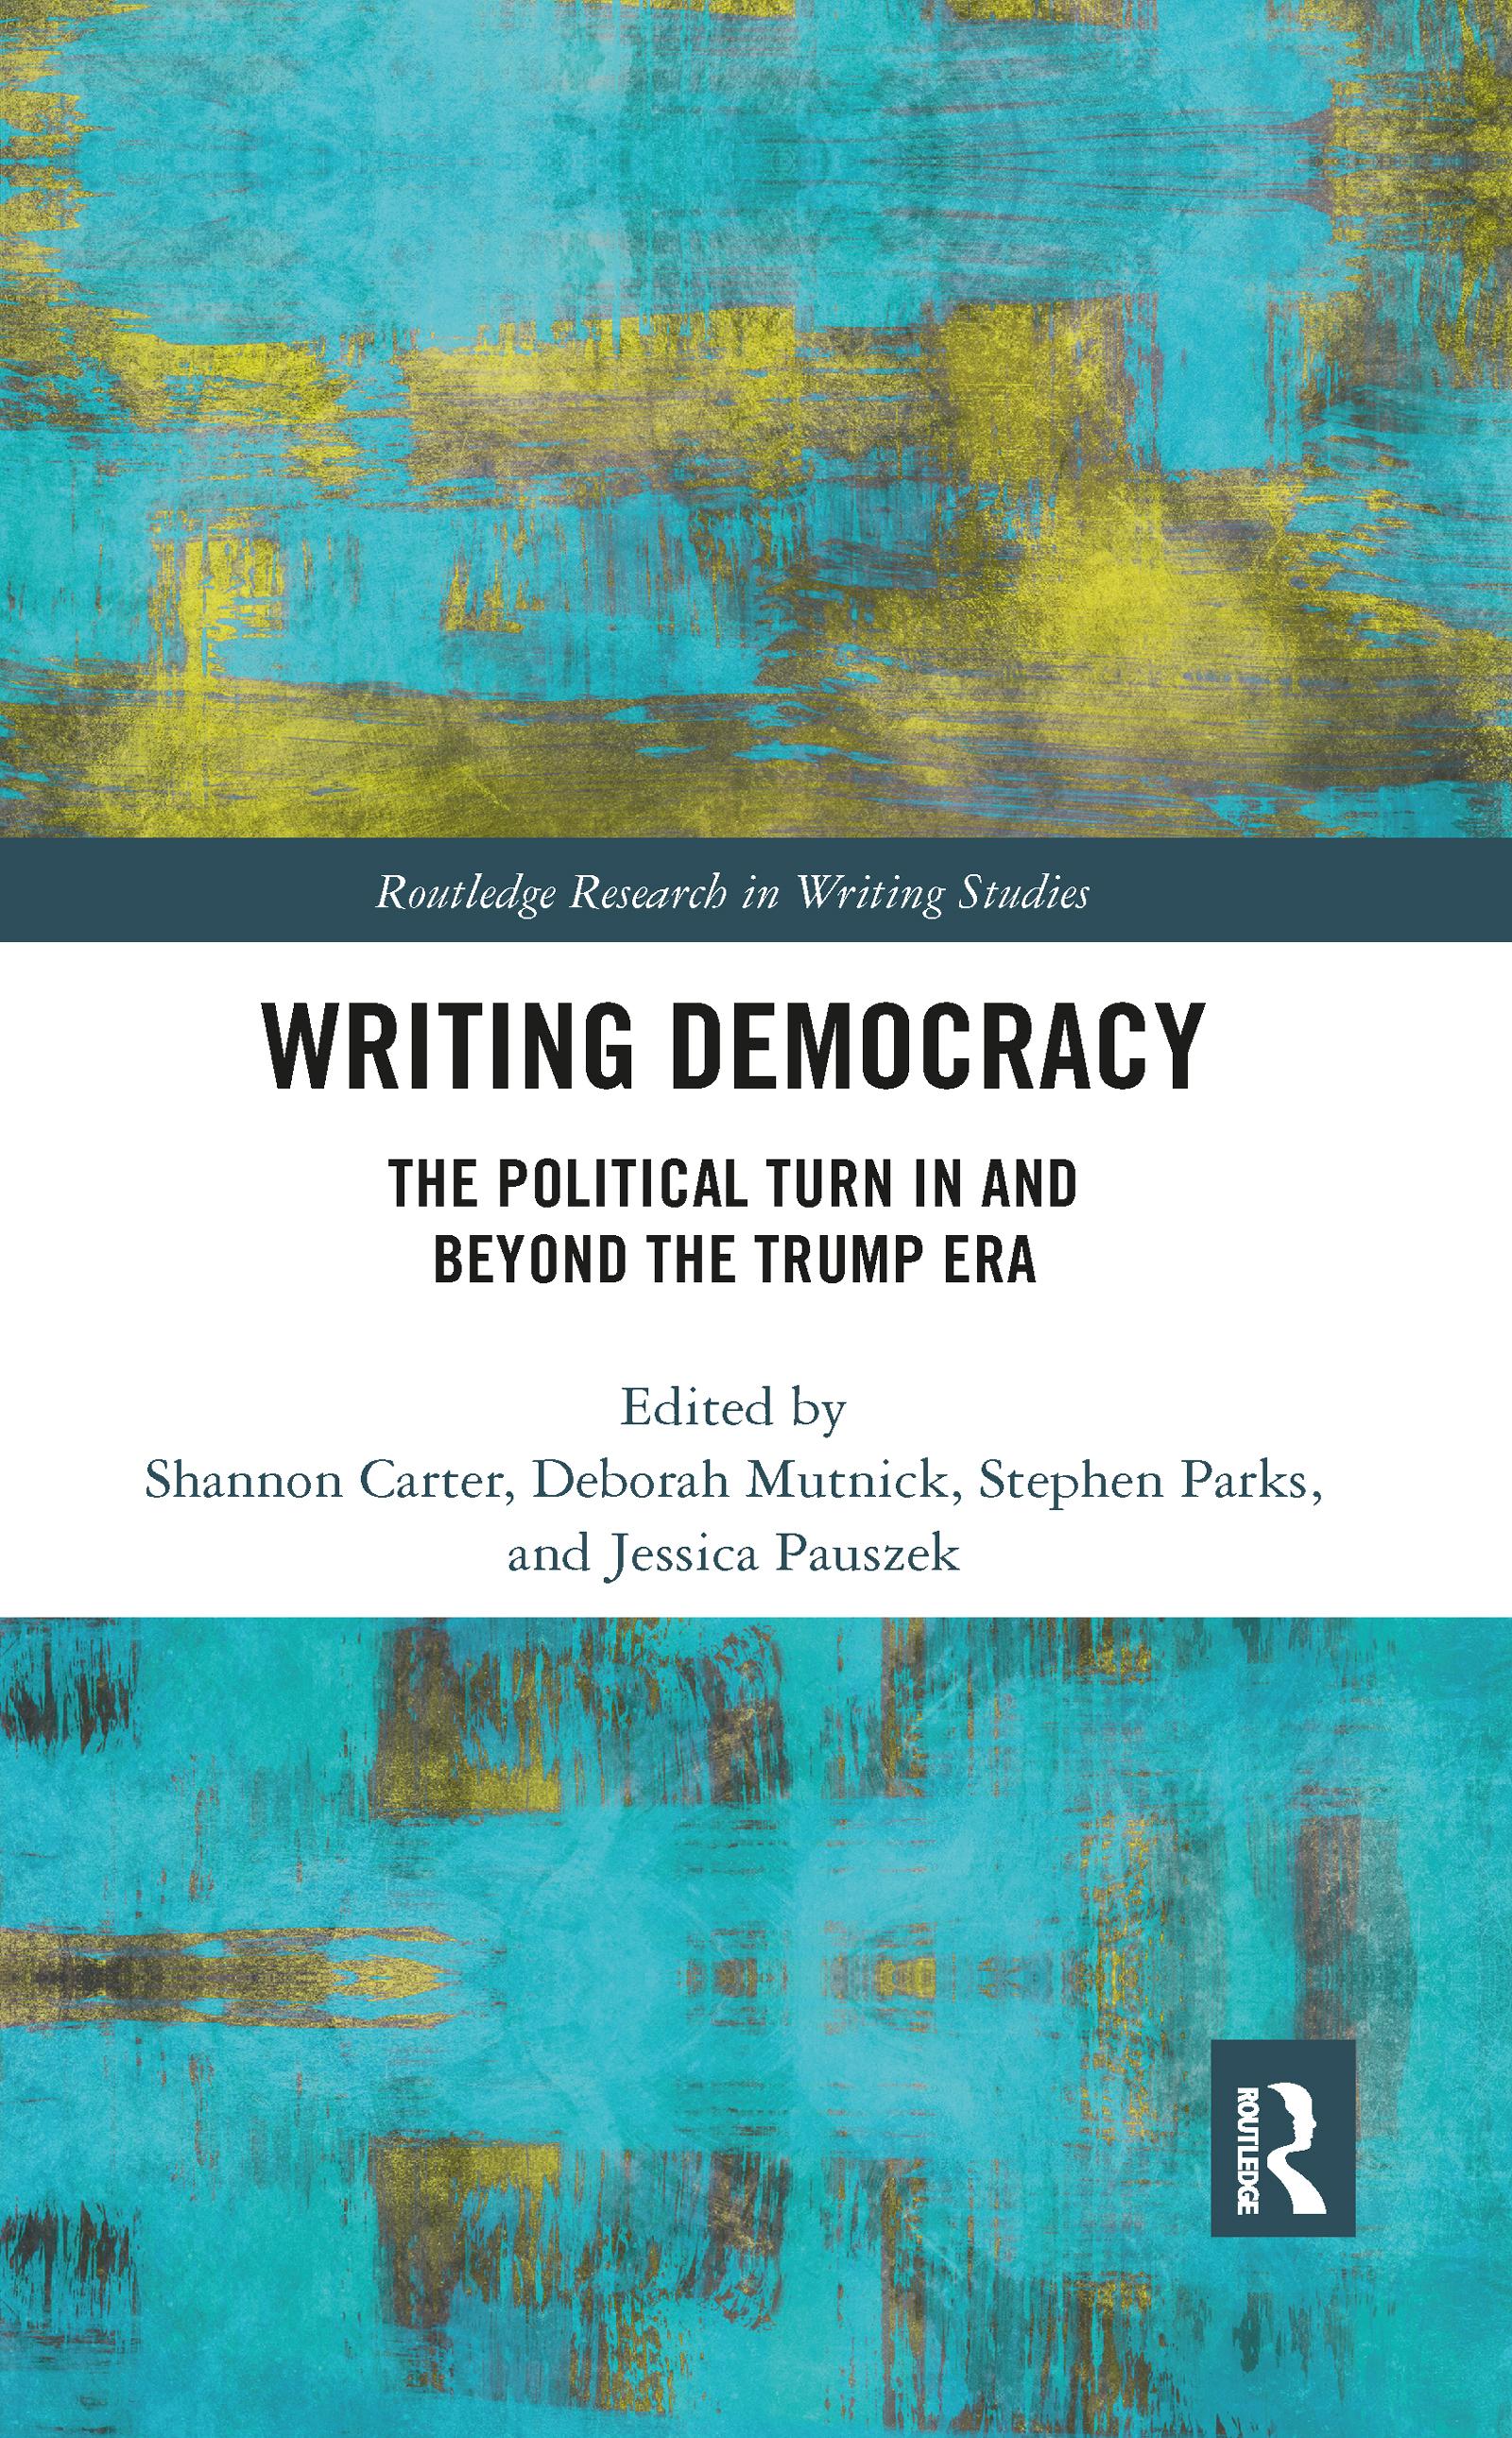 Writing Democracy